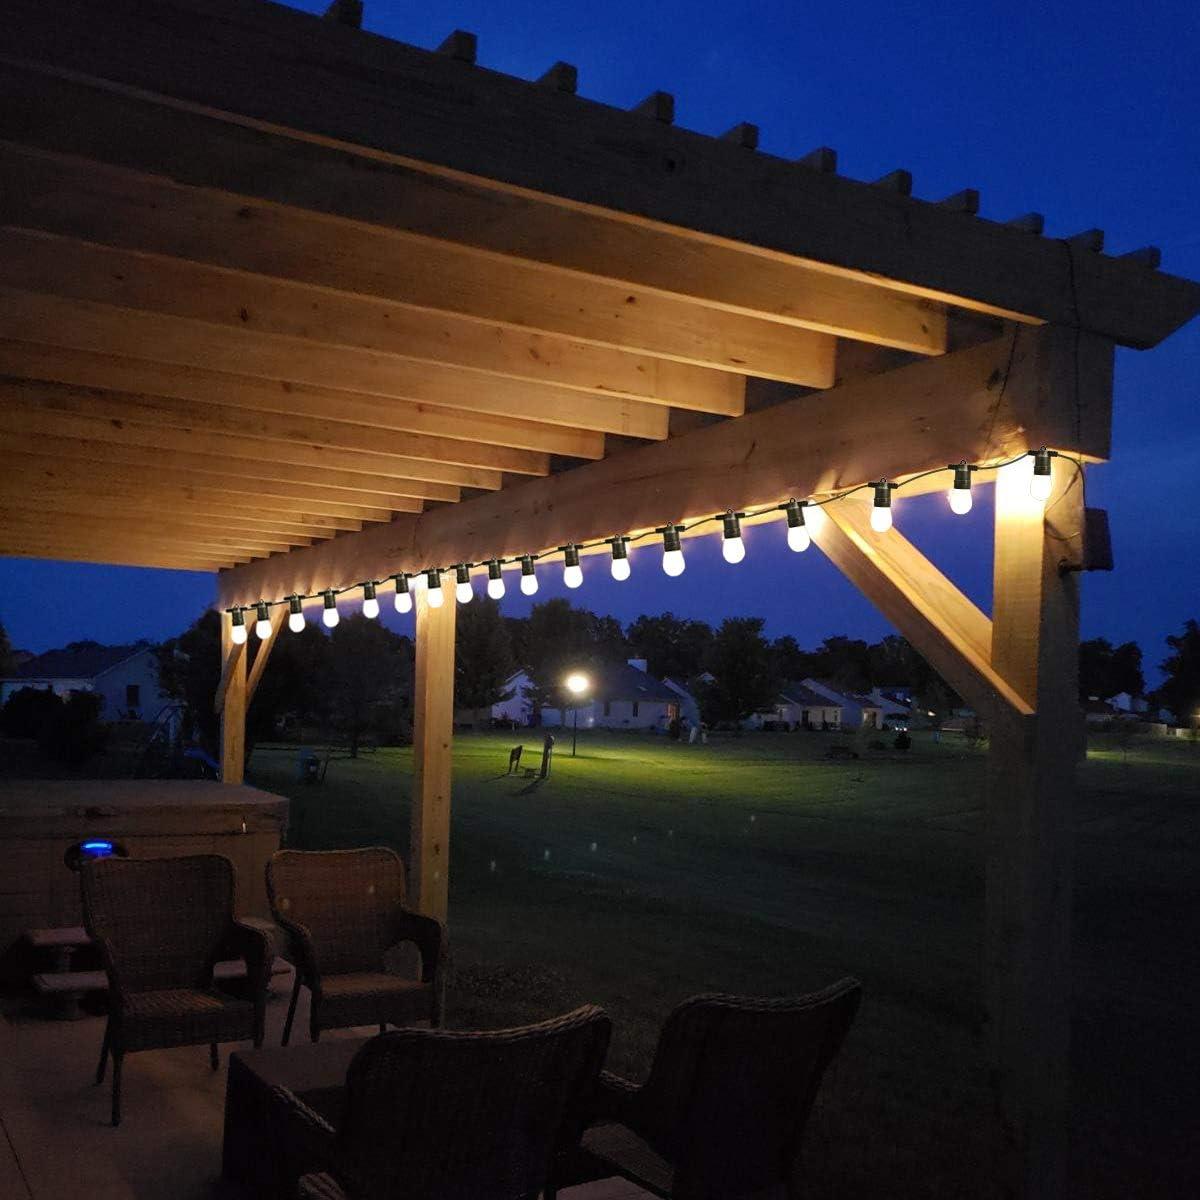 Luces de cadena al aire libre 8,2 m IP65 impermeable S14 bombillas solares E26 zócalos 3 luces LED de atenuación luz blanca cálida para interior patio boda (10 bombillas): Amazon.es: Iluminación